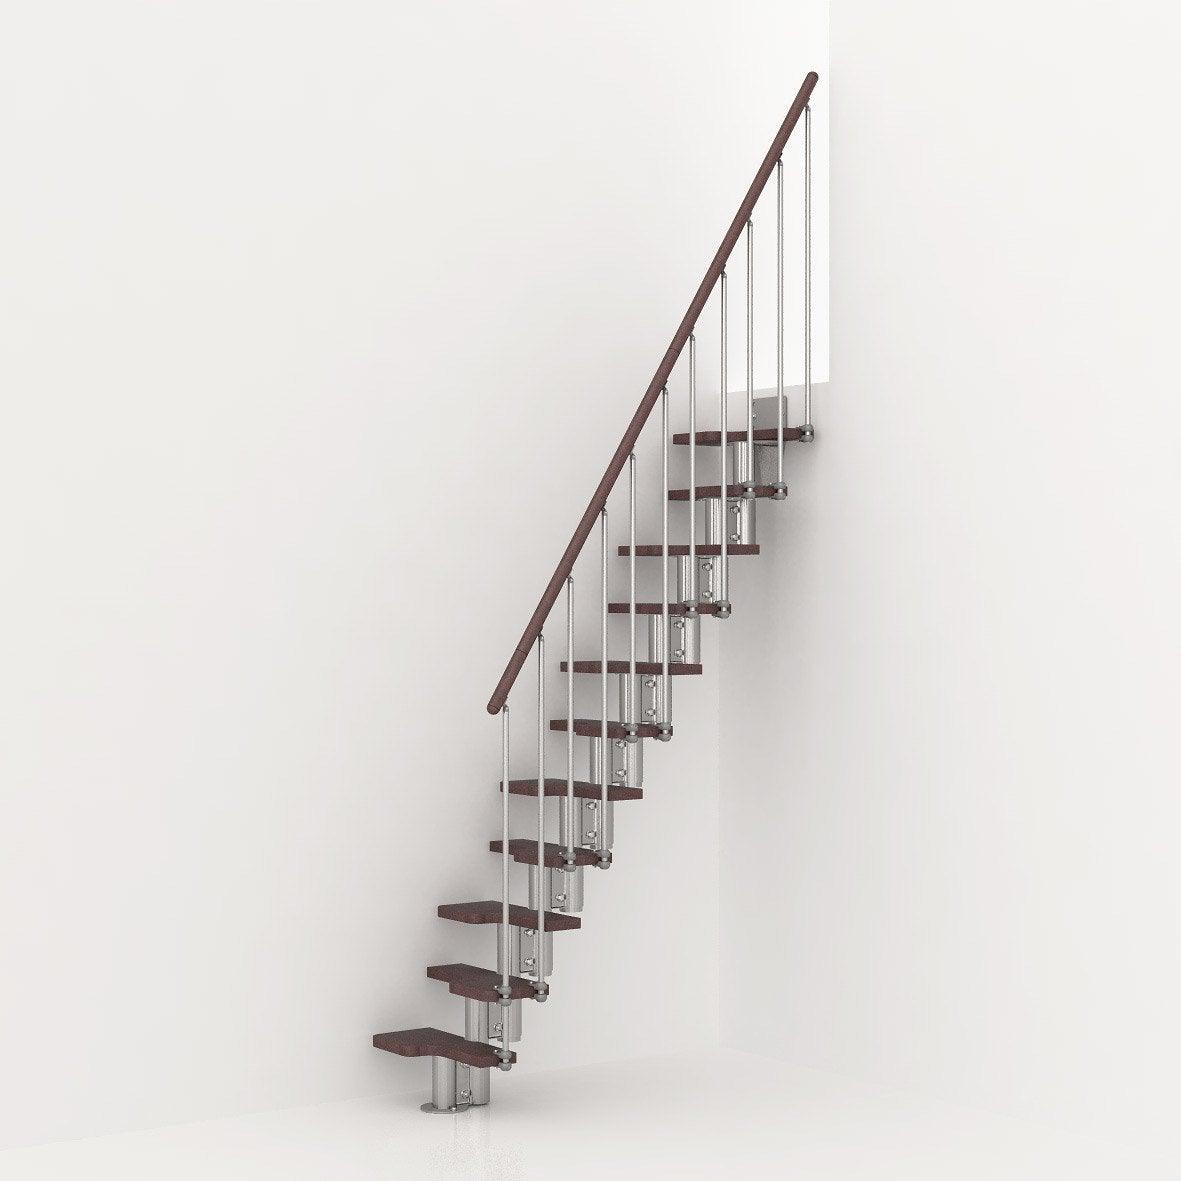 Garde corps pour escalier mini chrom en bois fonc pixima leroy merlin - Garde corps escalier interieur leroy merlin ...